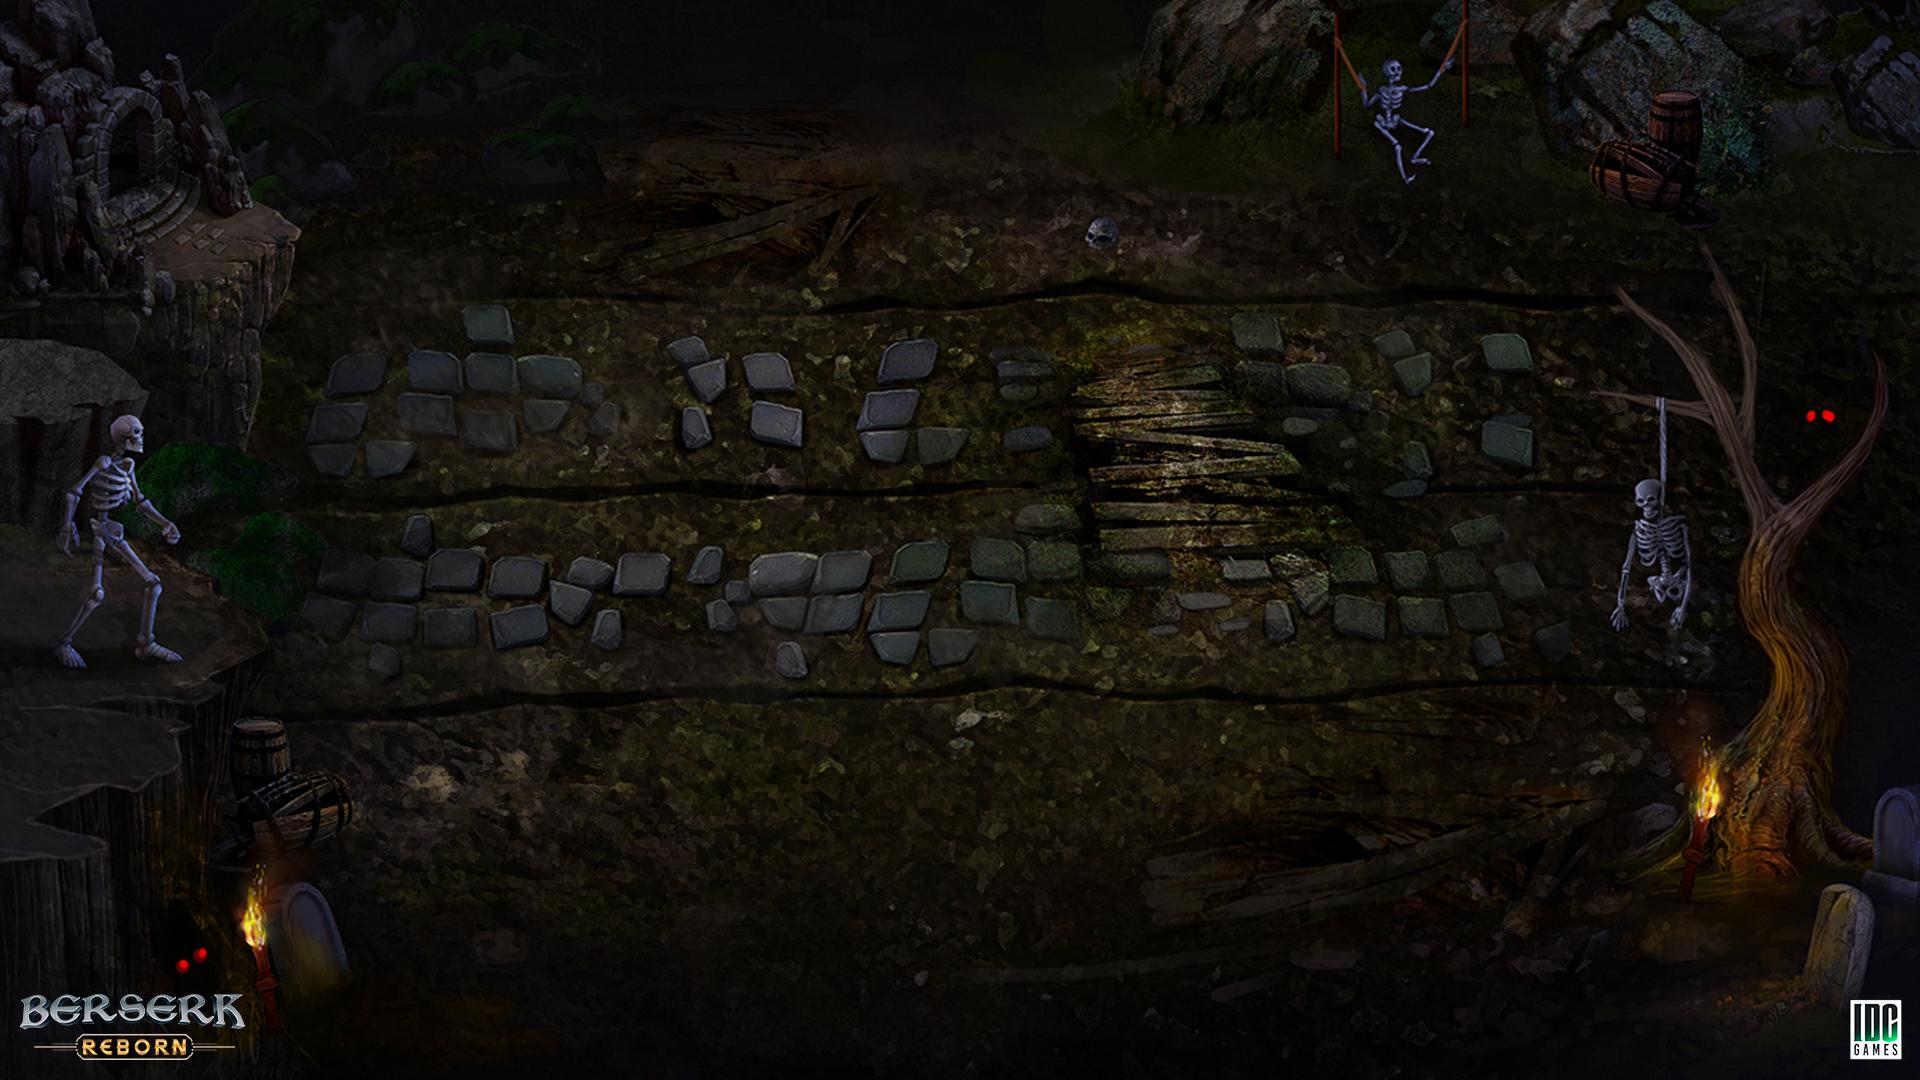 Berserk Reborn - Darkness Wallpaper